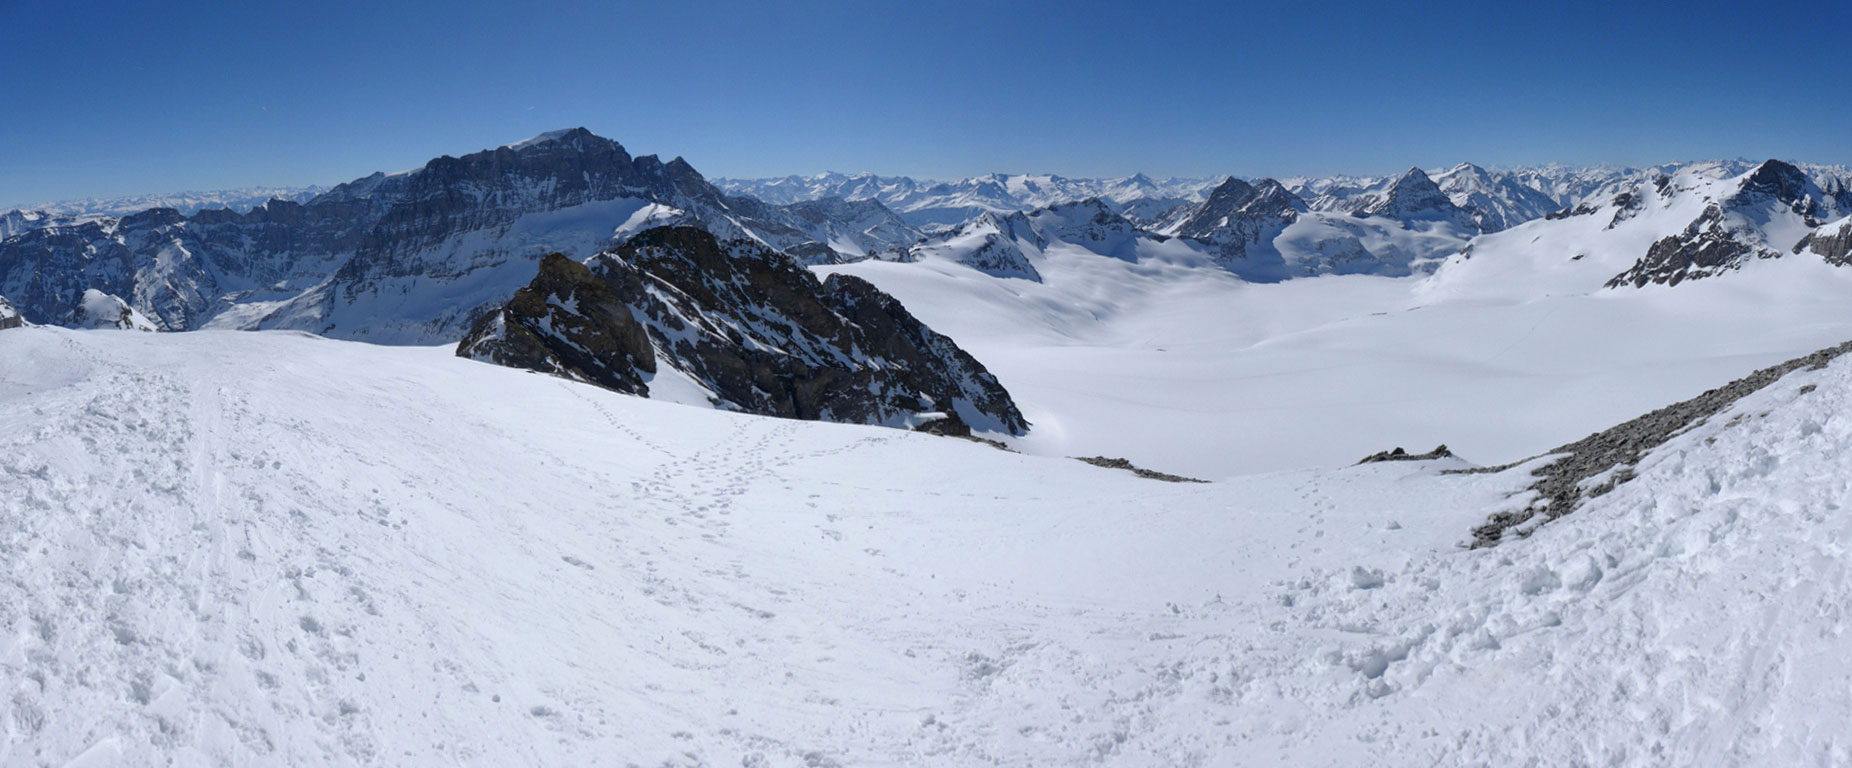 Clariden S, from Planurahütte Glarner Alpen Switzerland panorama 22